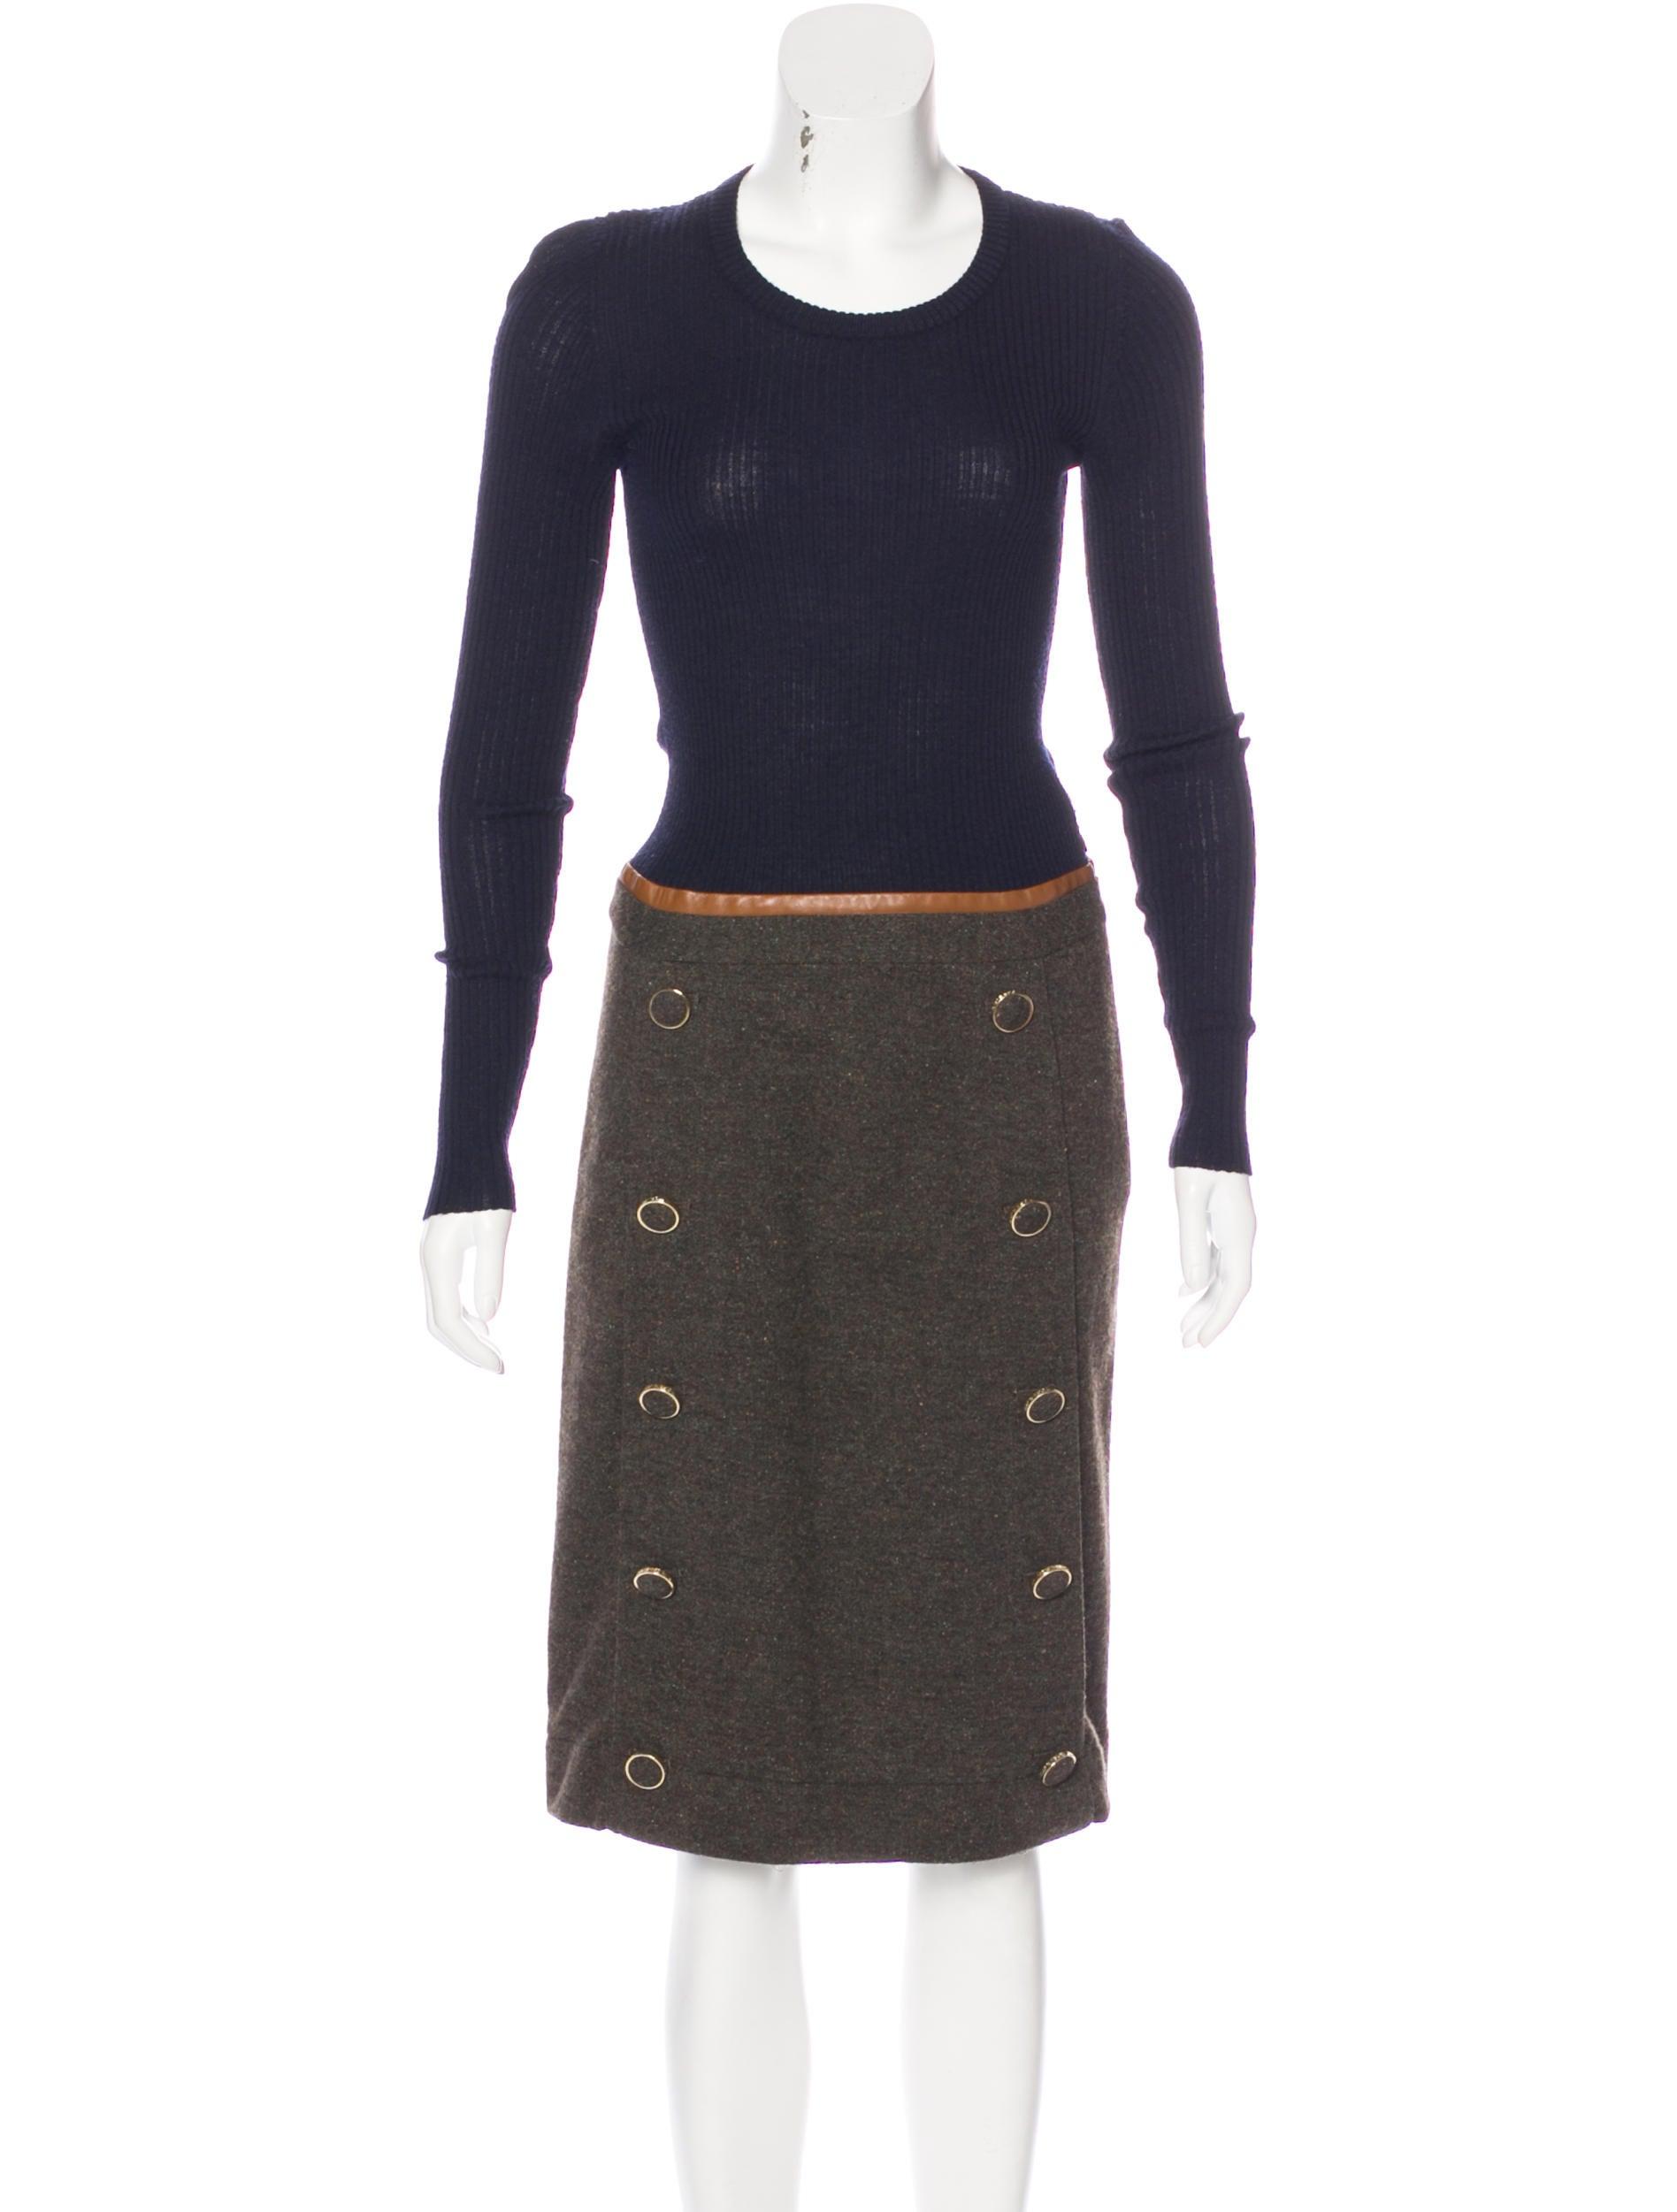 Tory Burch Wool Long Sleeve Dress Clothing Wto102996